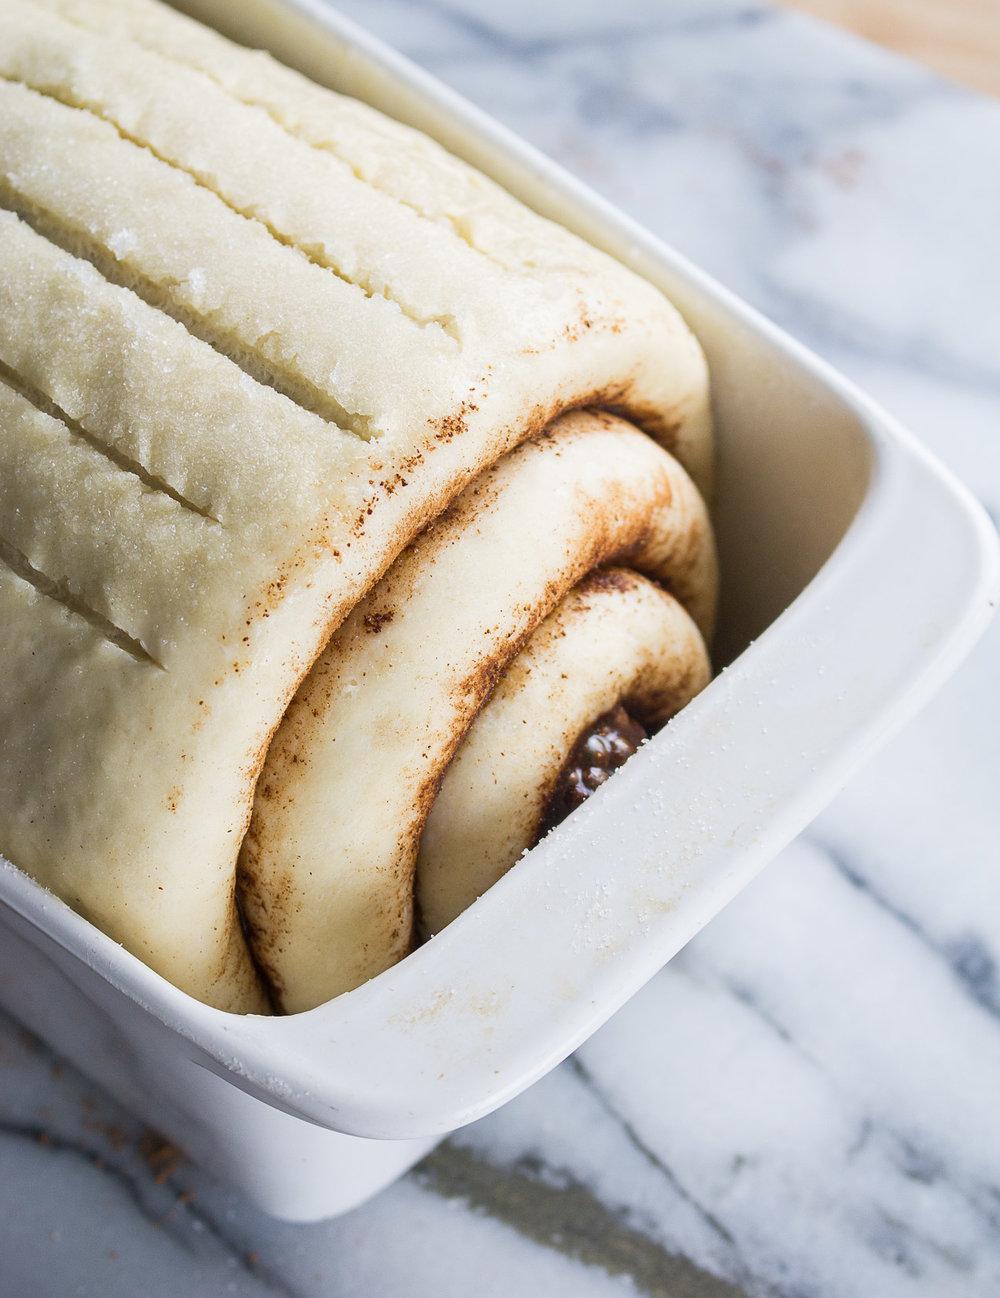 maida-heatter-cinnamon-bread-8.jpg